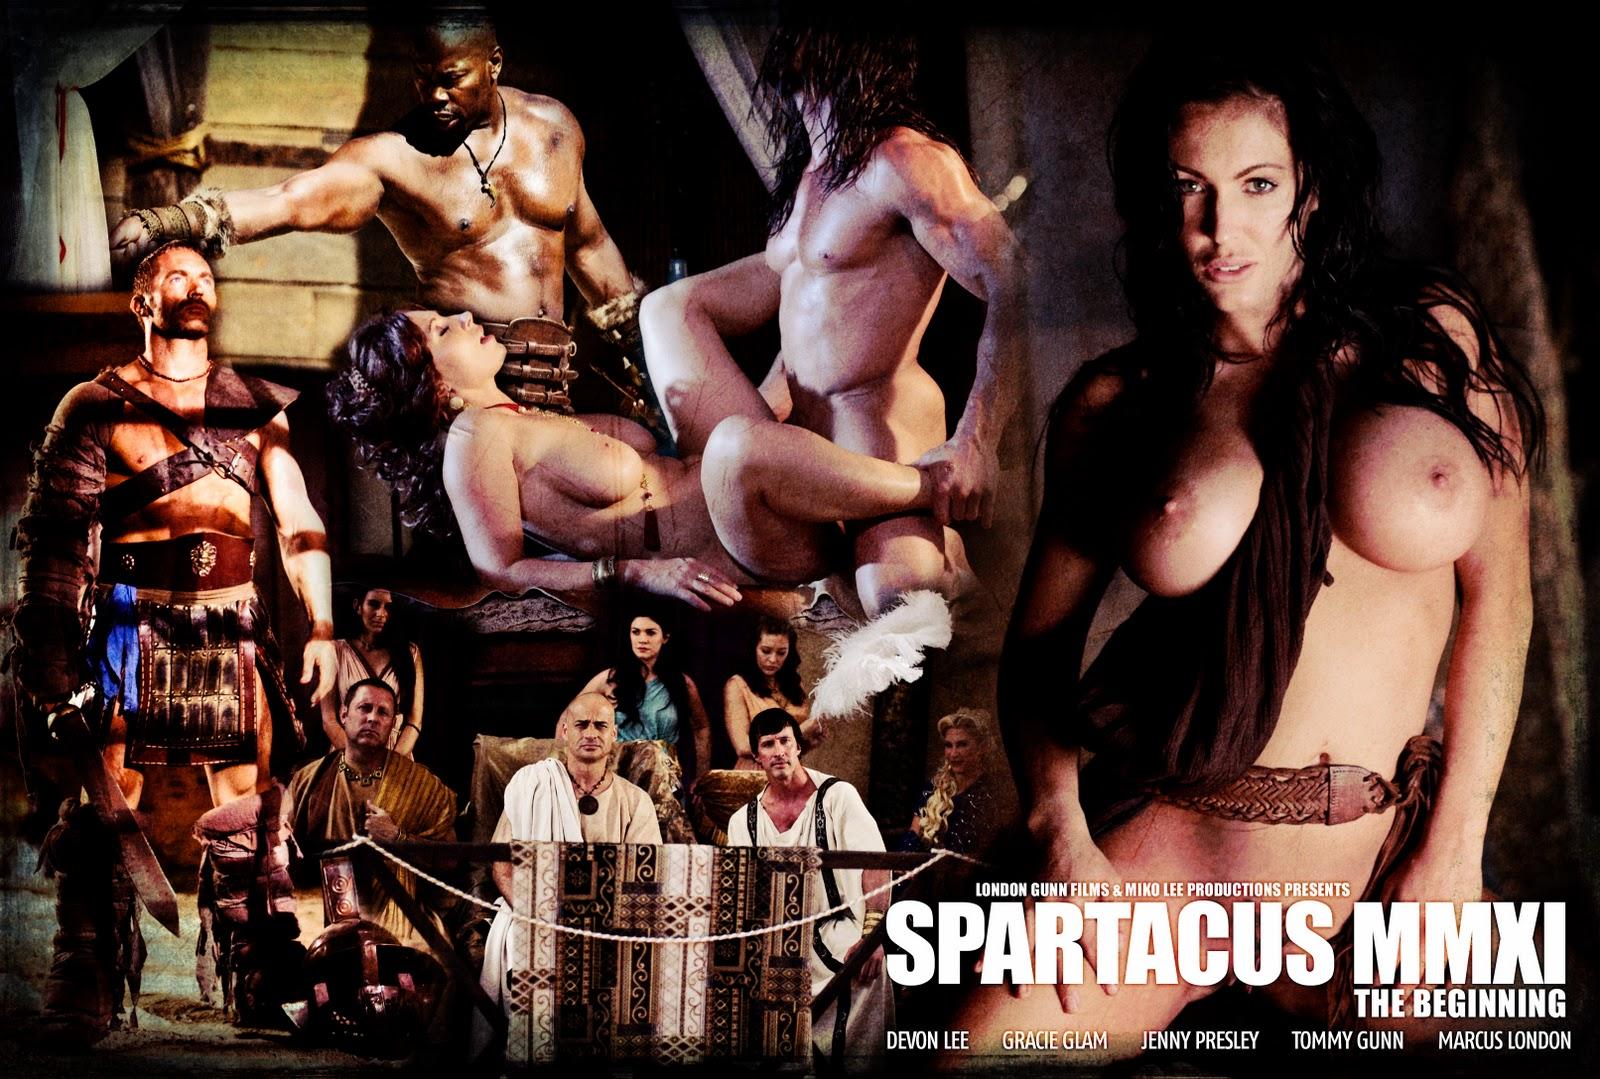 Spartacus mmxii the beginning porn video tube